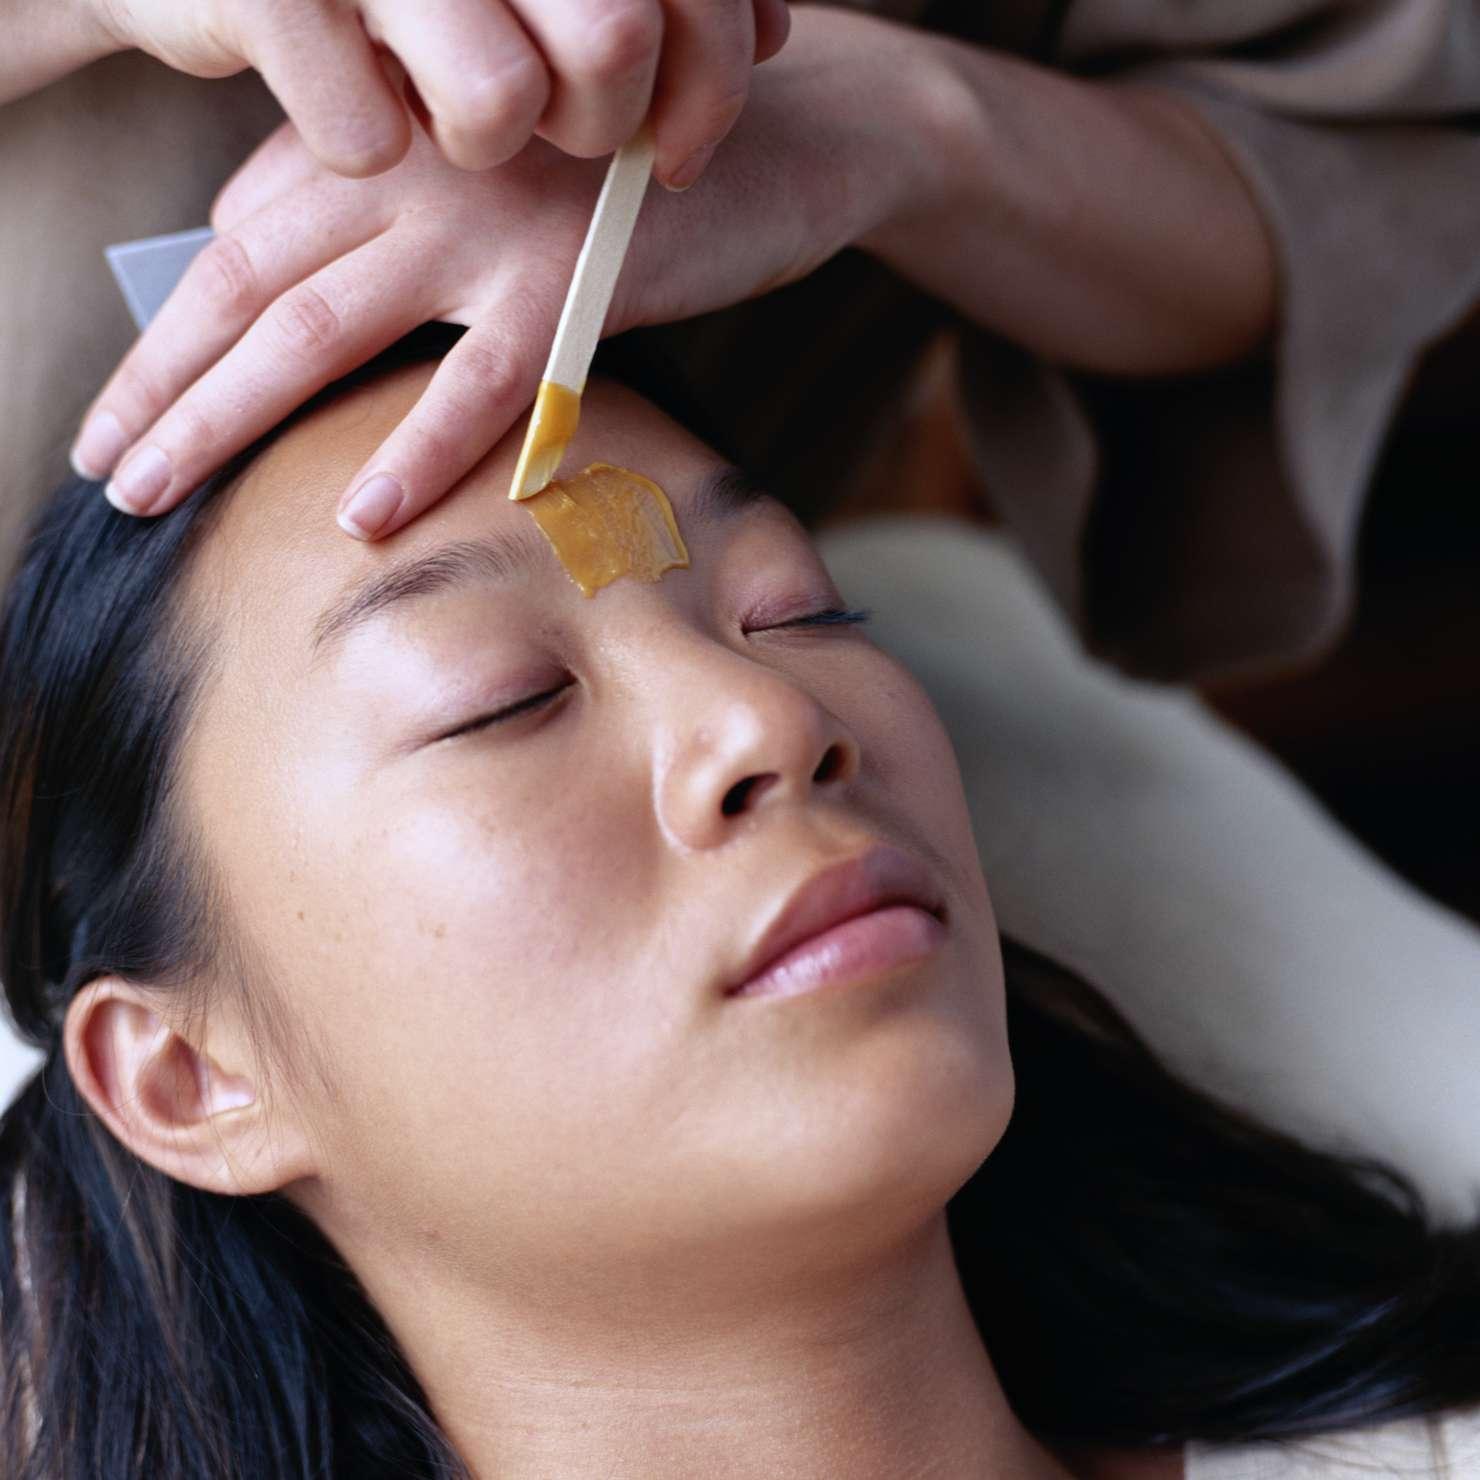 A woman having her eyebrows sugar waxed